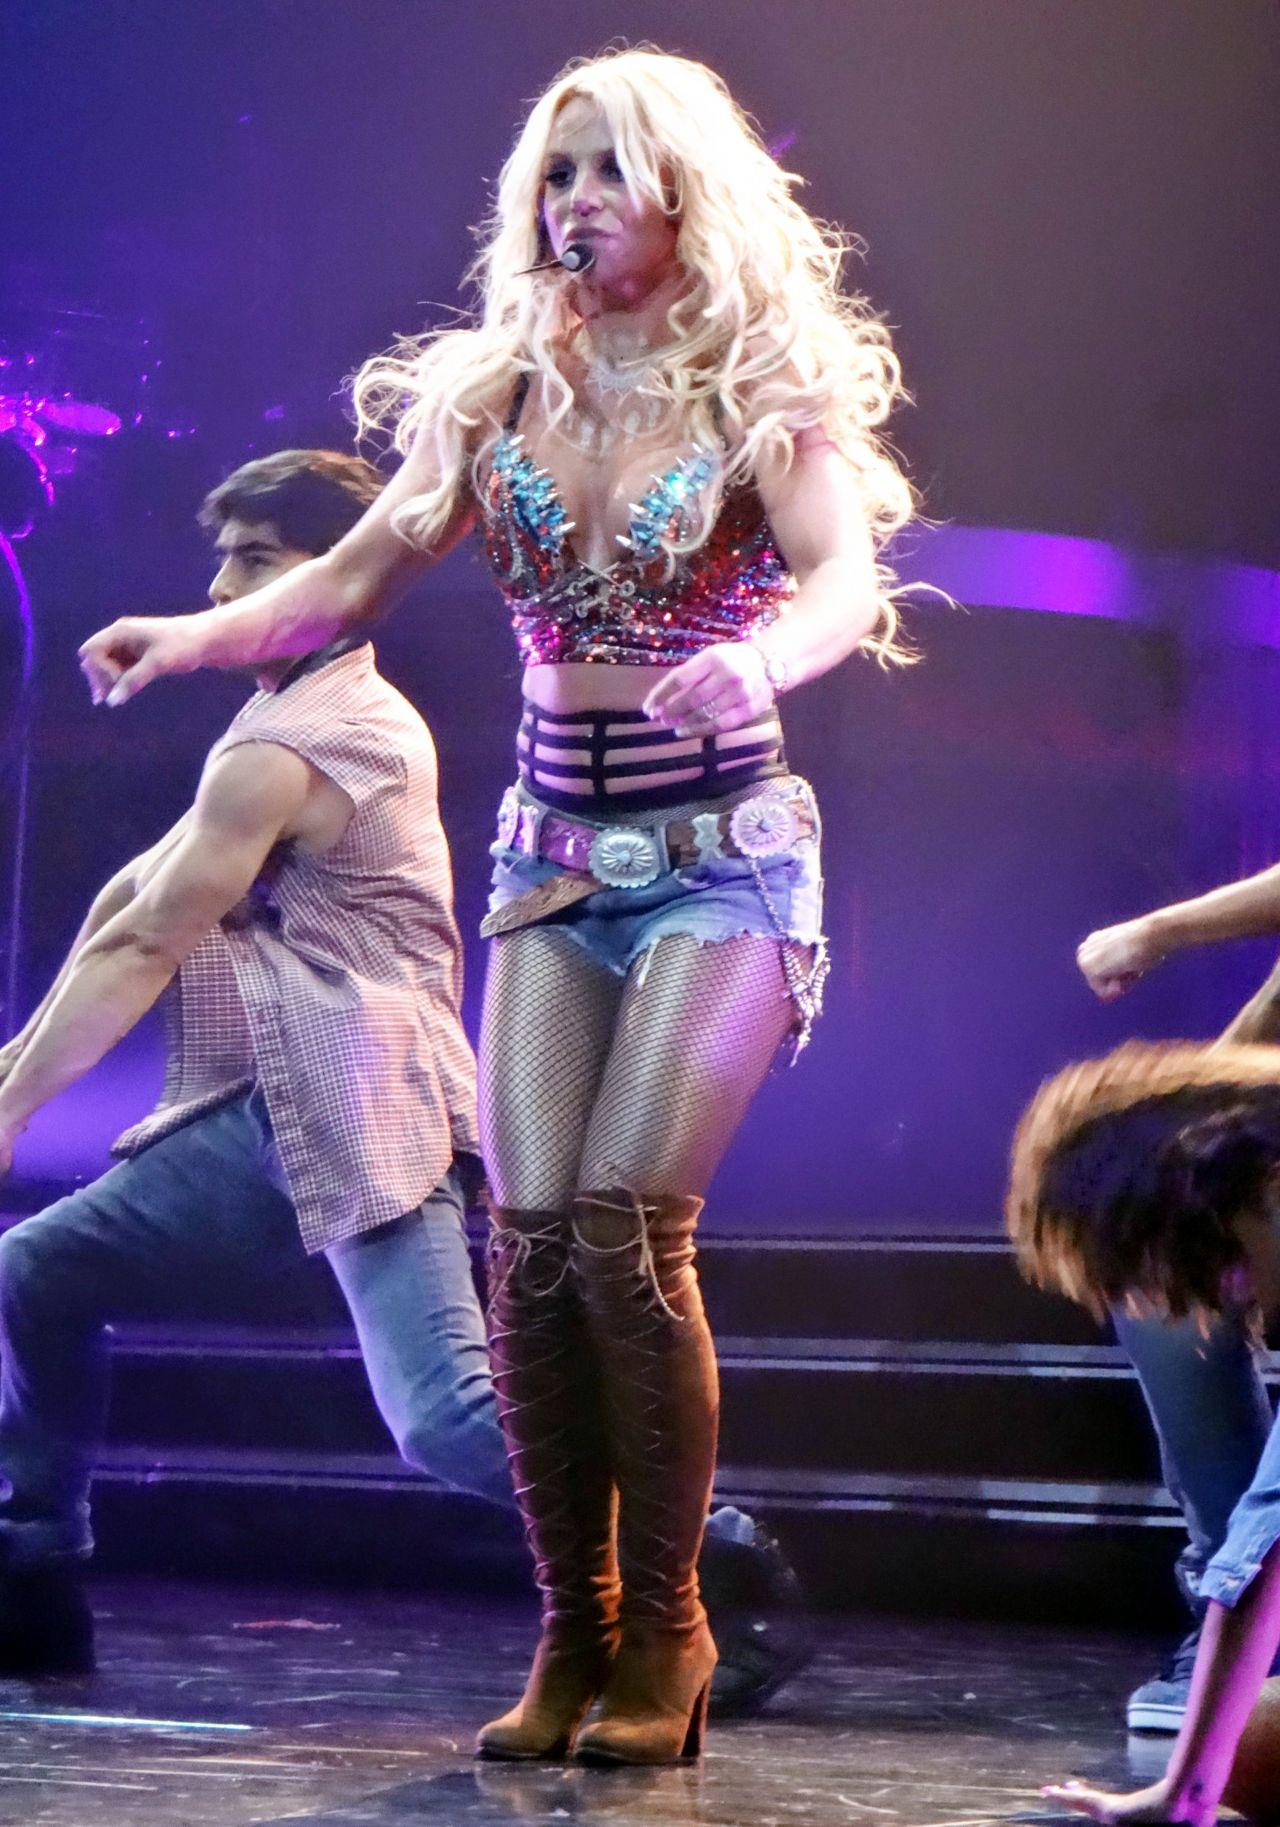 Britney Spears - Performing at Her 'Piece of Me' Residency in Las Vegas  1/11/ 2017 • CelebMafia